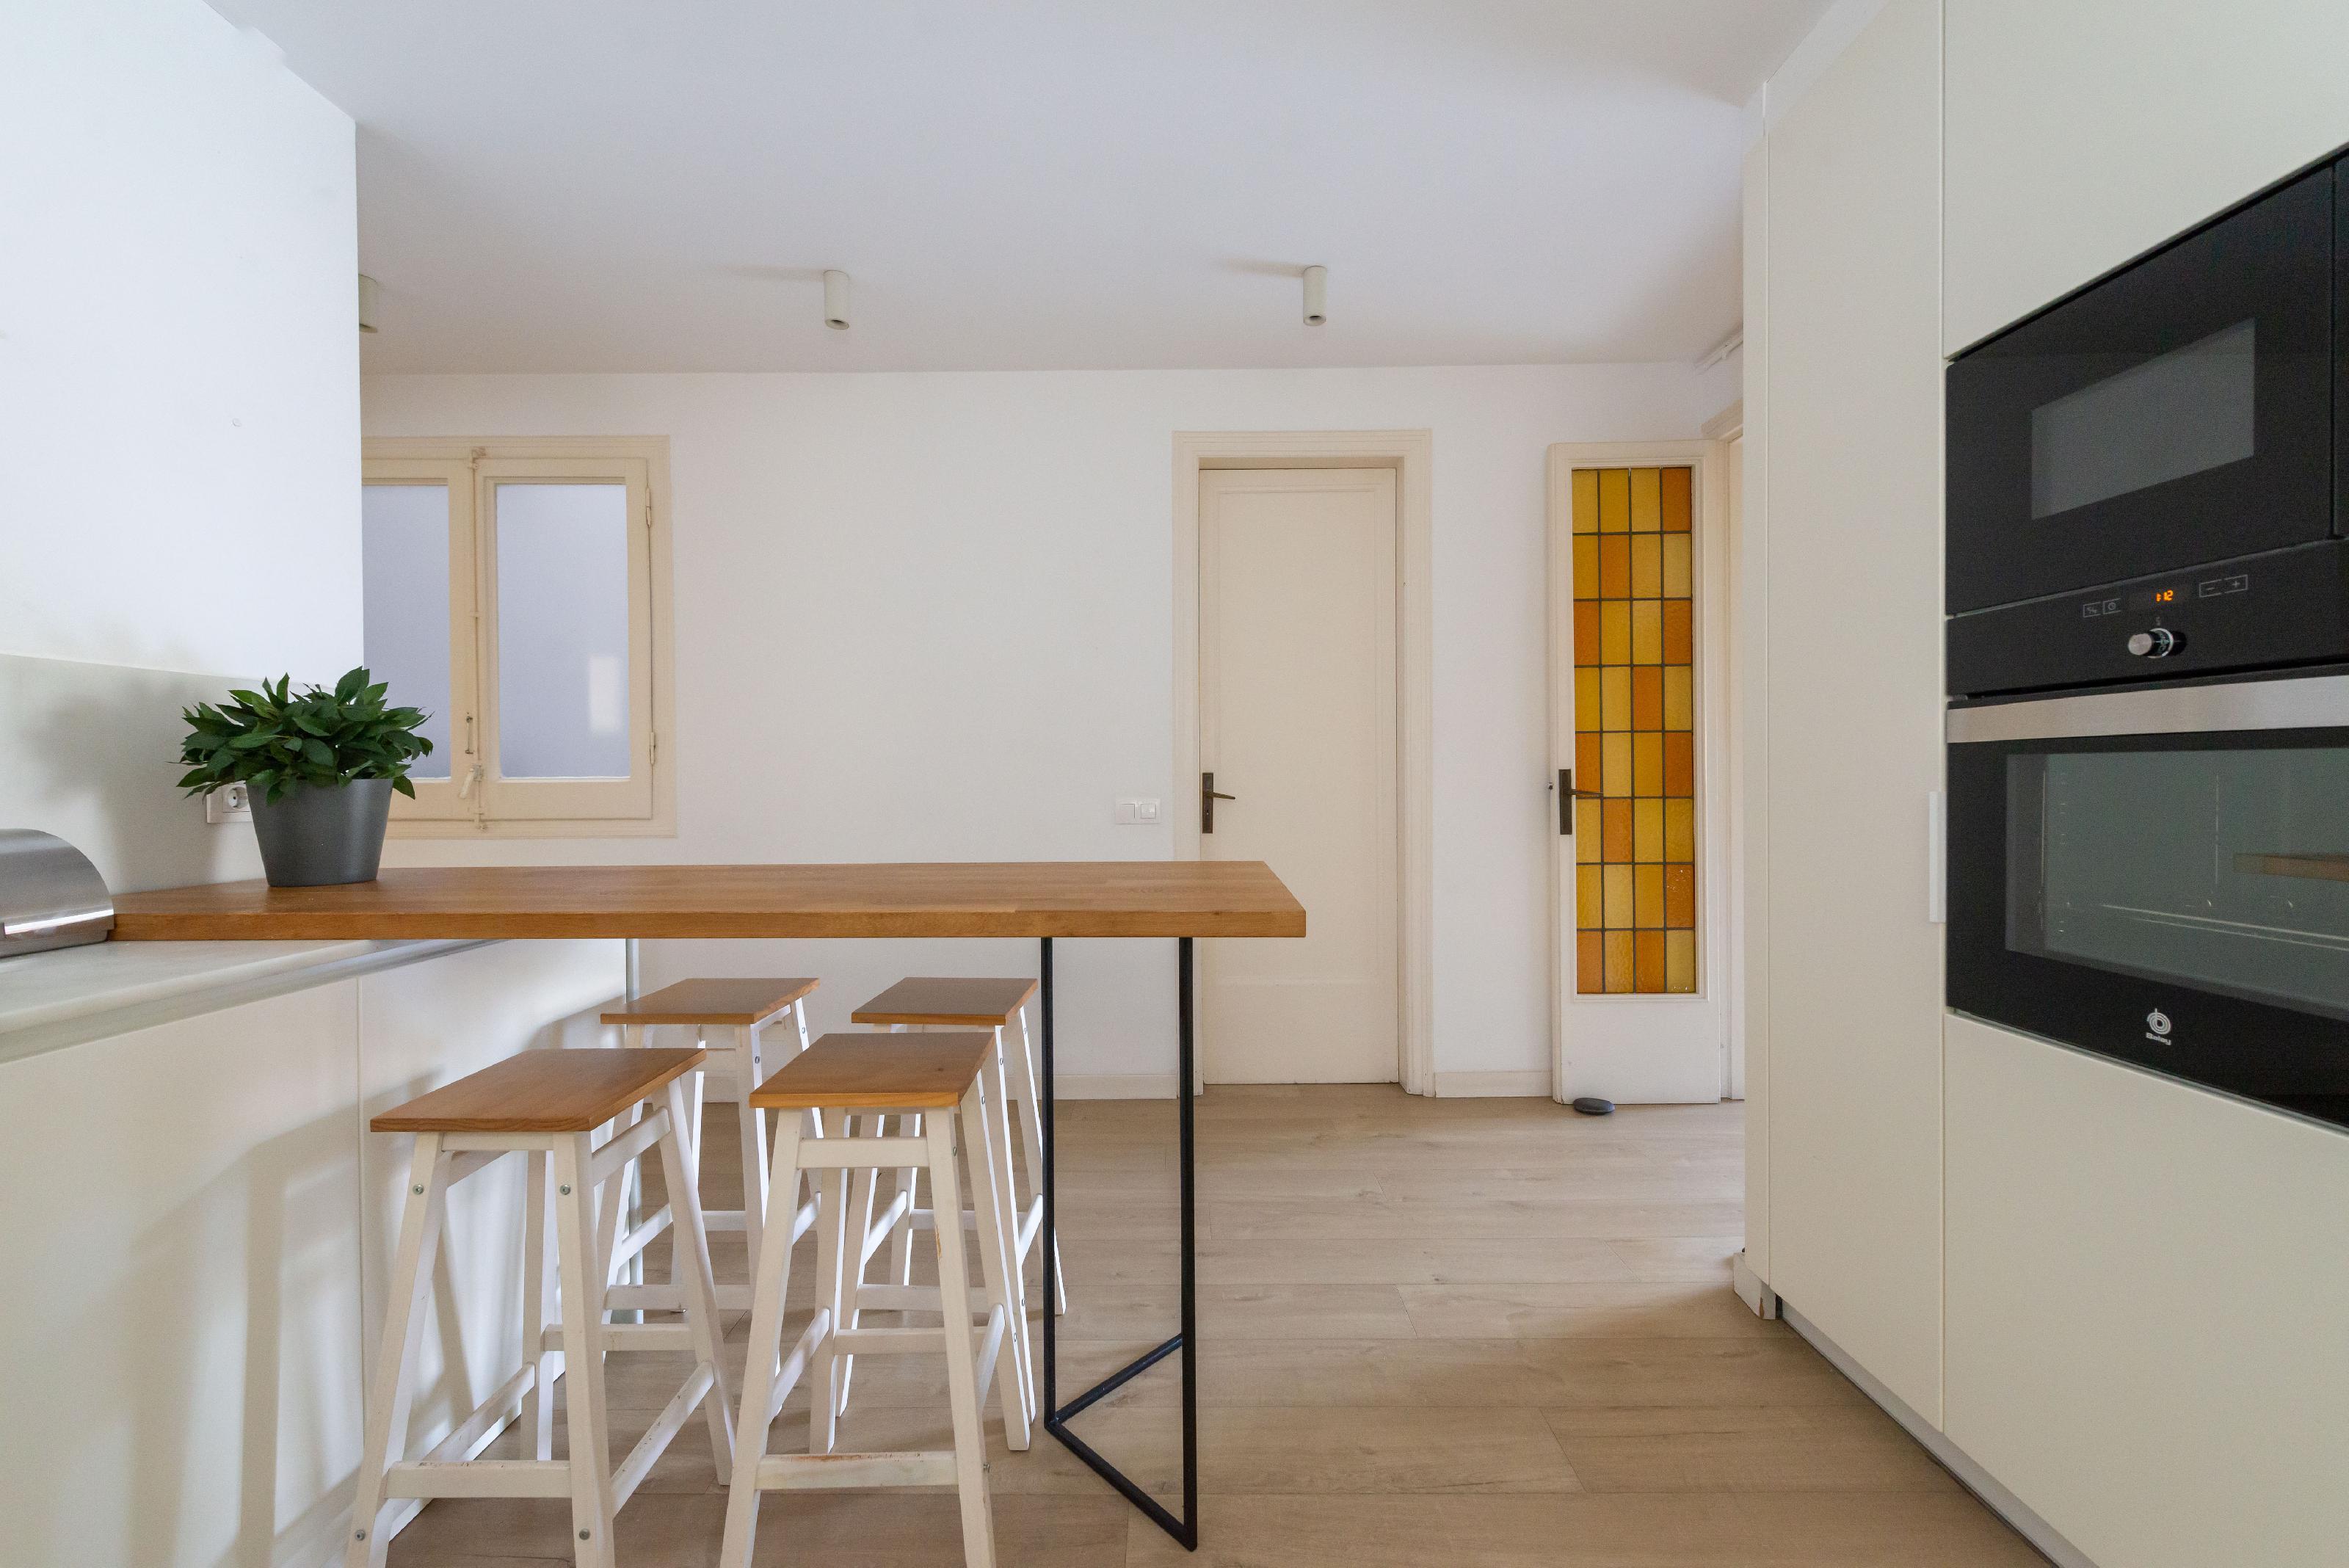 250005 Flat for sale in Sarrià-Sant Gervasi, Sant Gervasi-Galvany 22